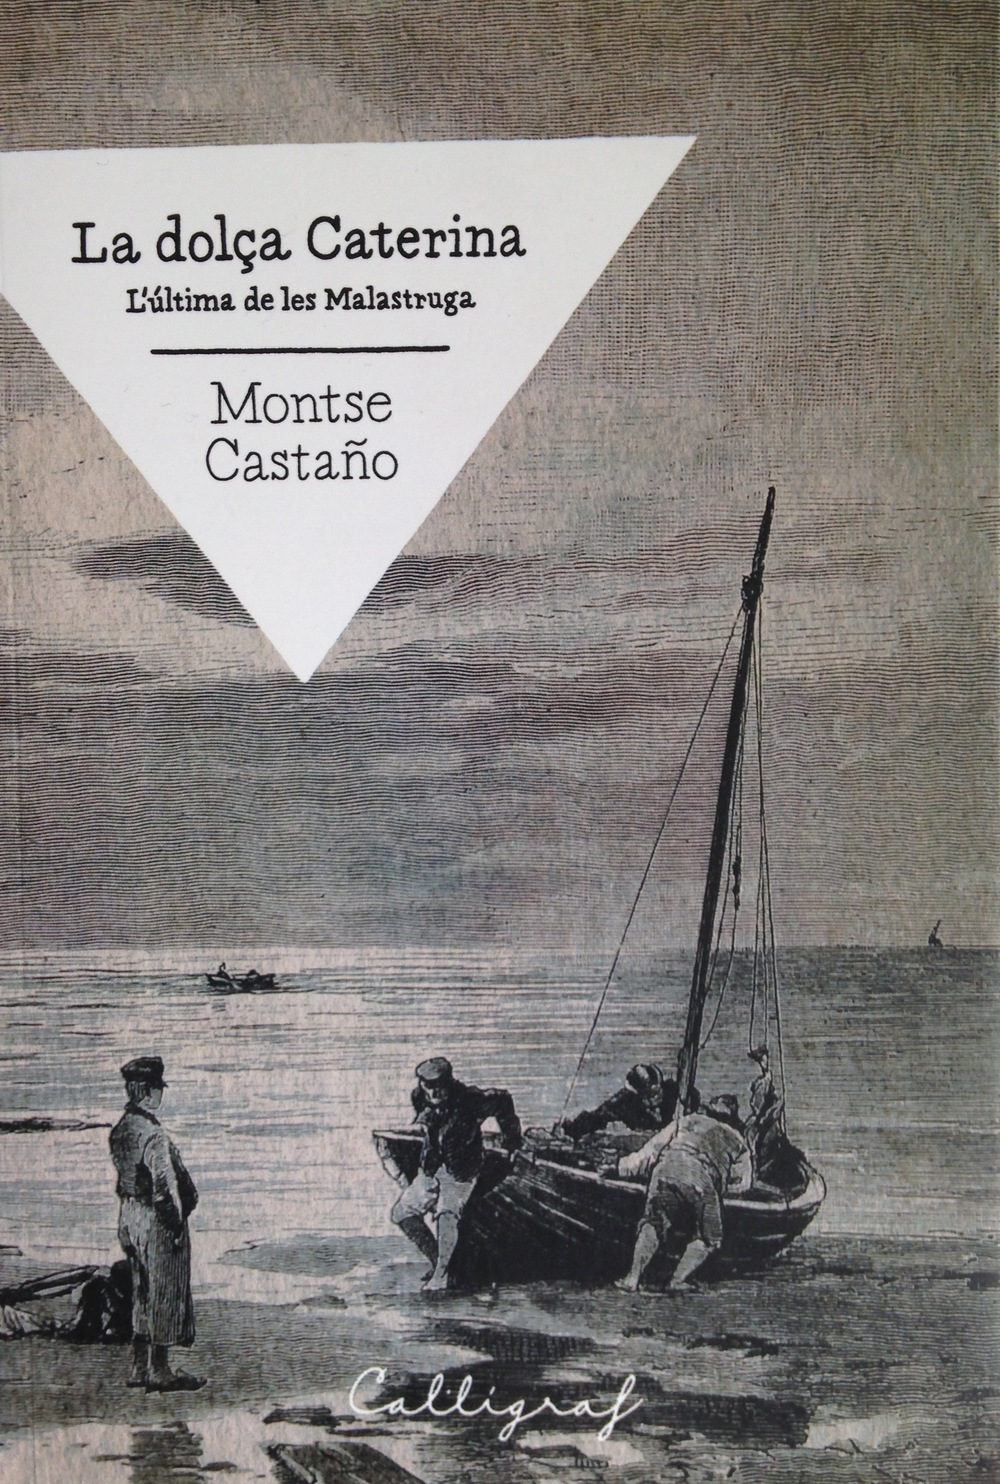 castaño2.jpg